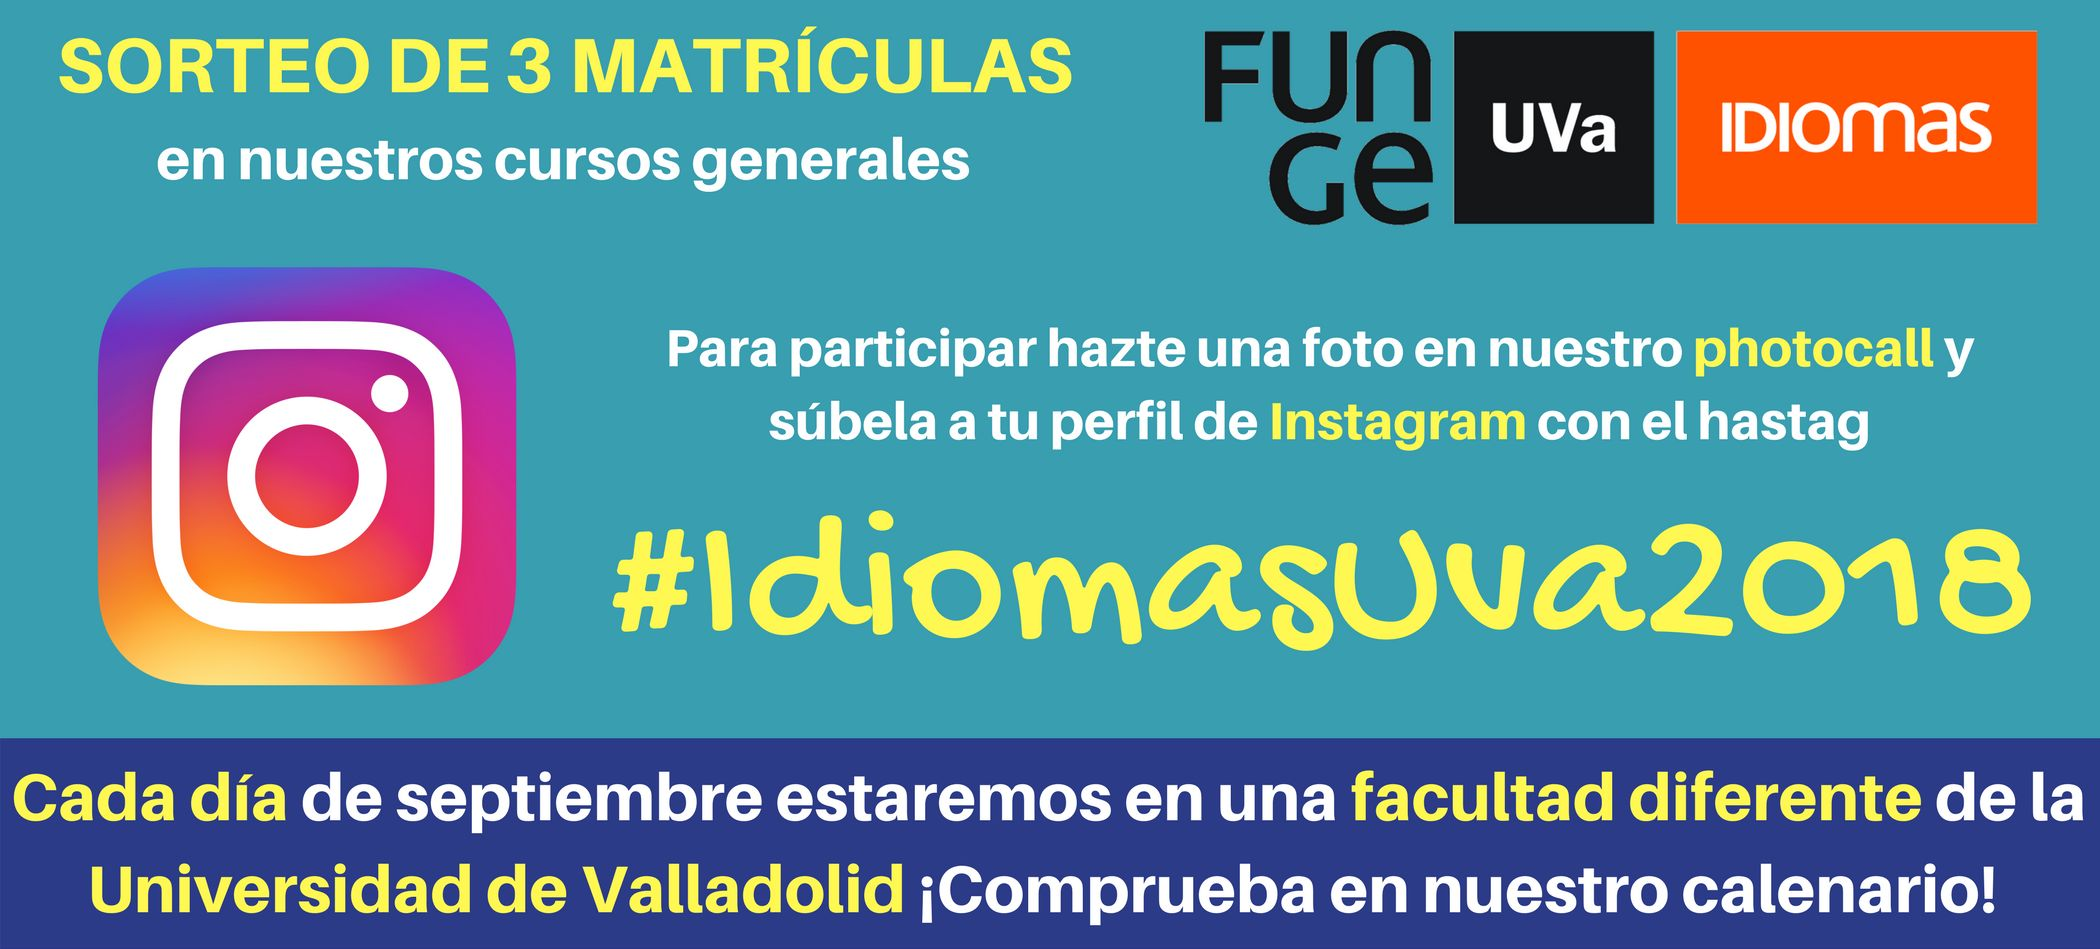 Concurso Instagram Centro de Idiomas